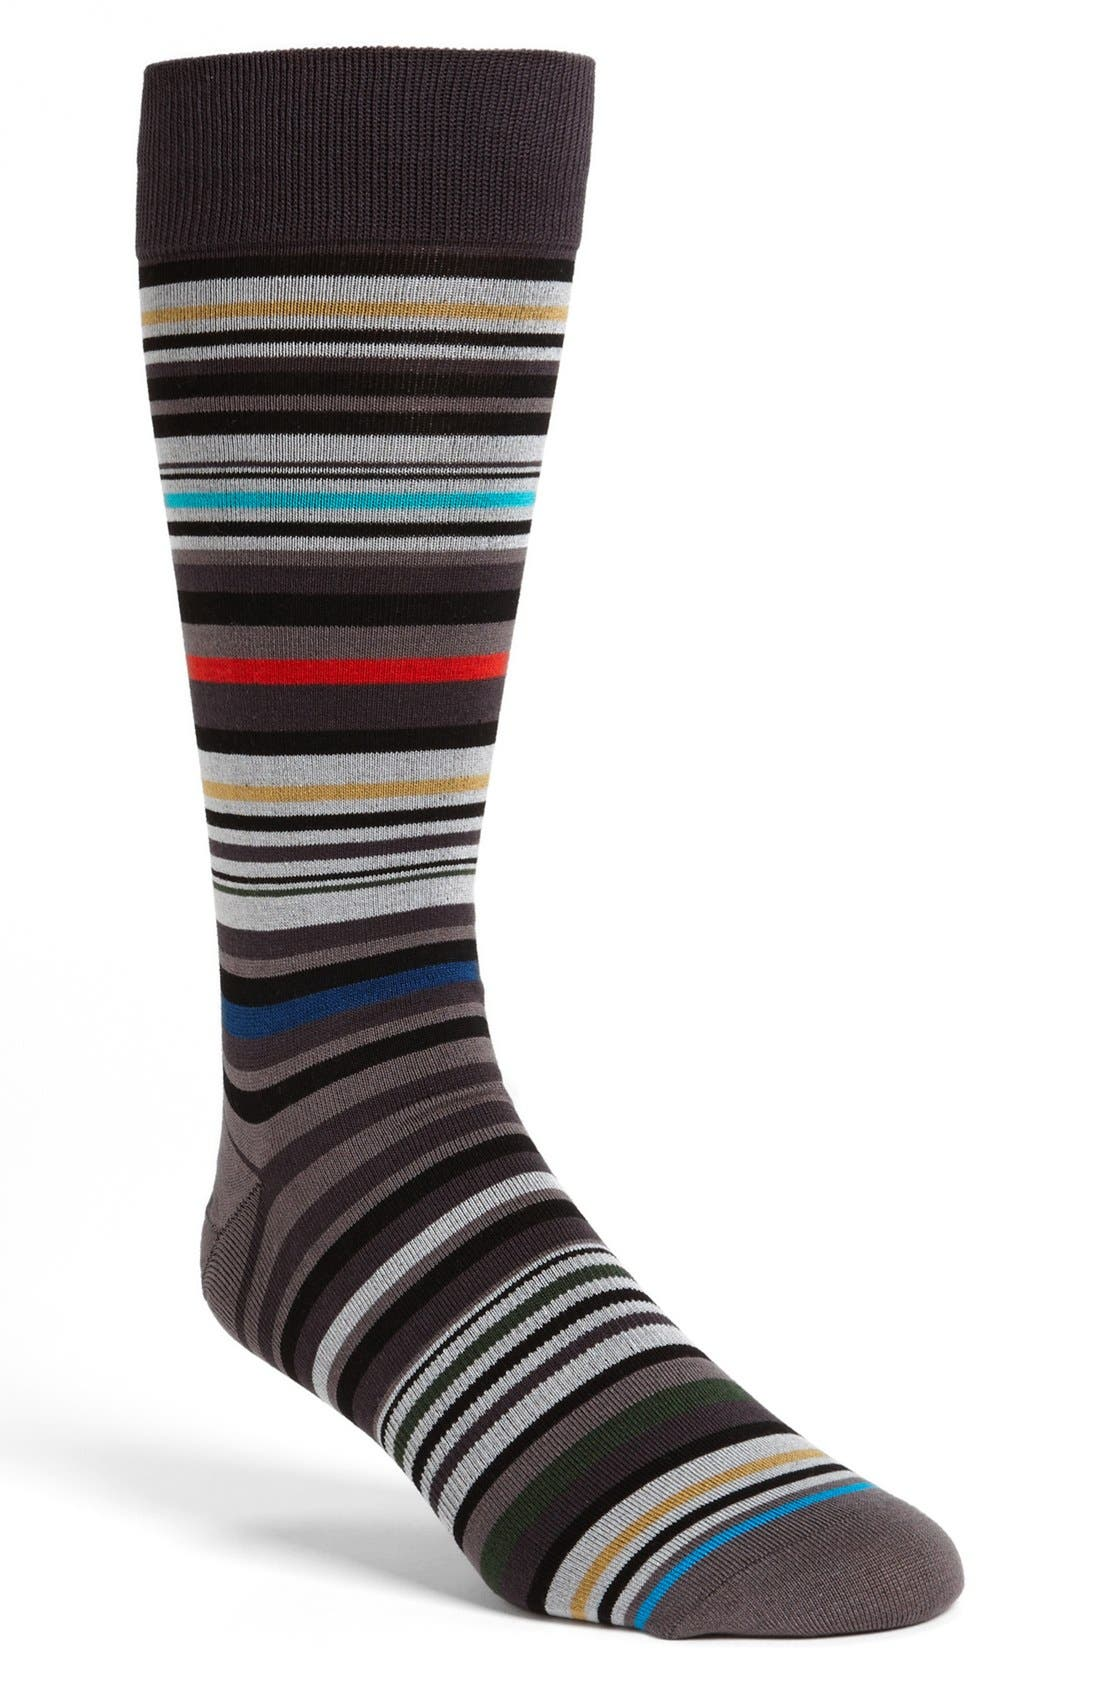 Alternate Image 1 Selected - Stance 'The Reserve - Hyde' Dress Socks